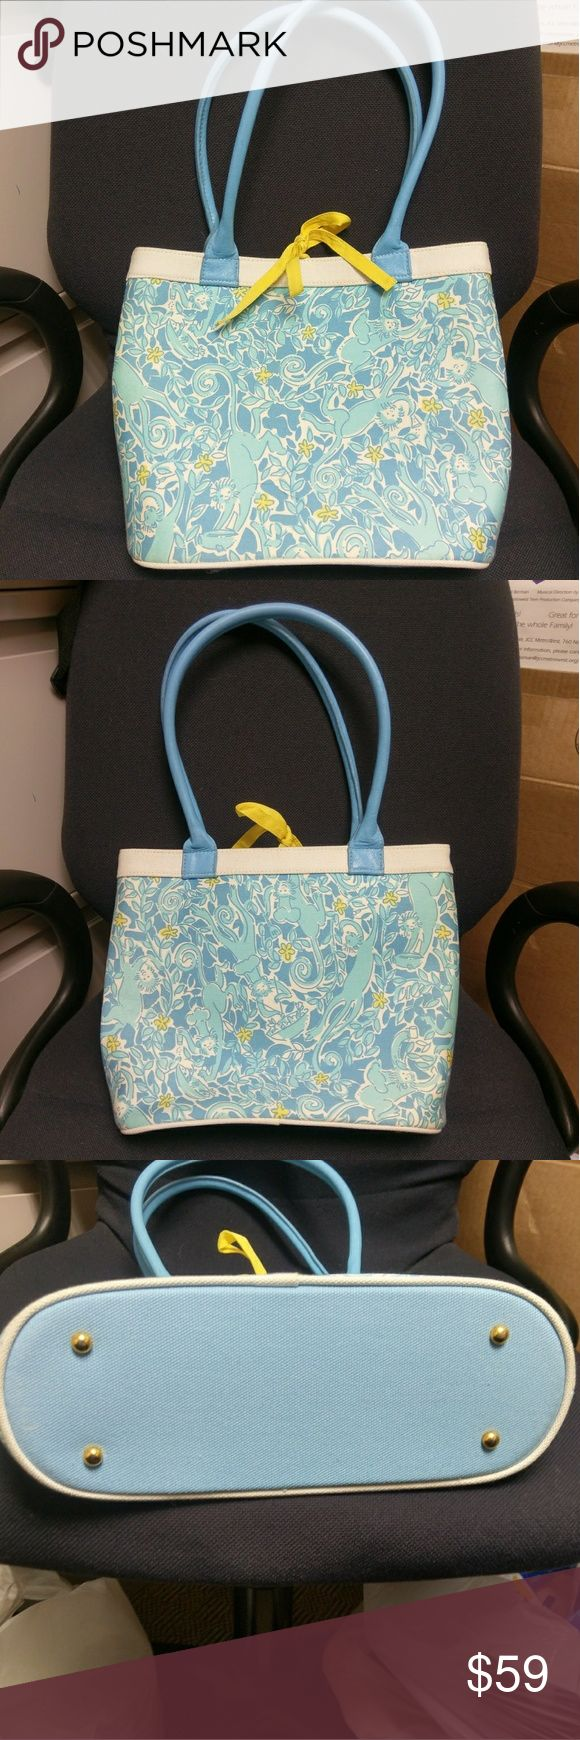 Lilly Pulitzer Monkey Bag So cute. 13 x 10 x 4 Lilly Pylitzer Monkey Bag. Never used. Lilly Pulitzer Bags